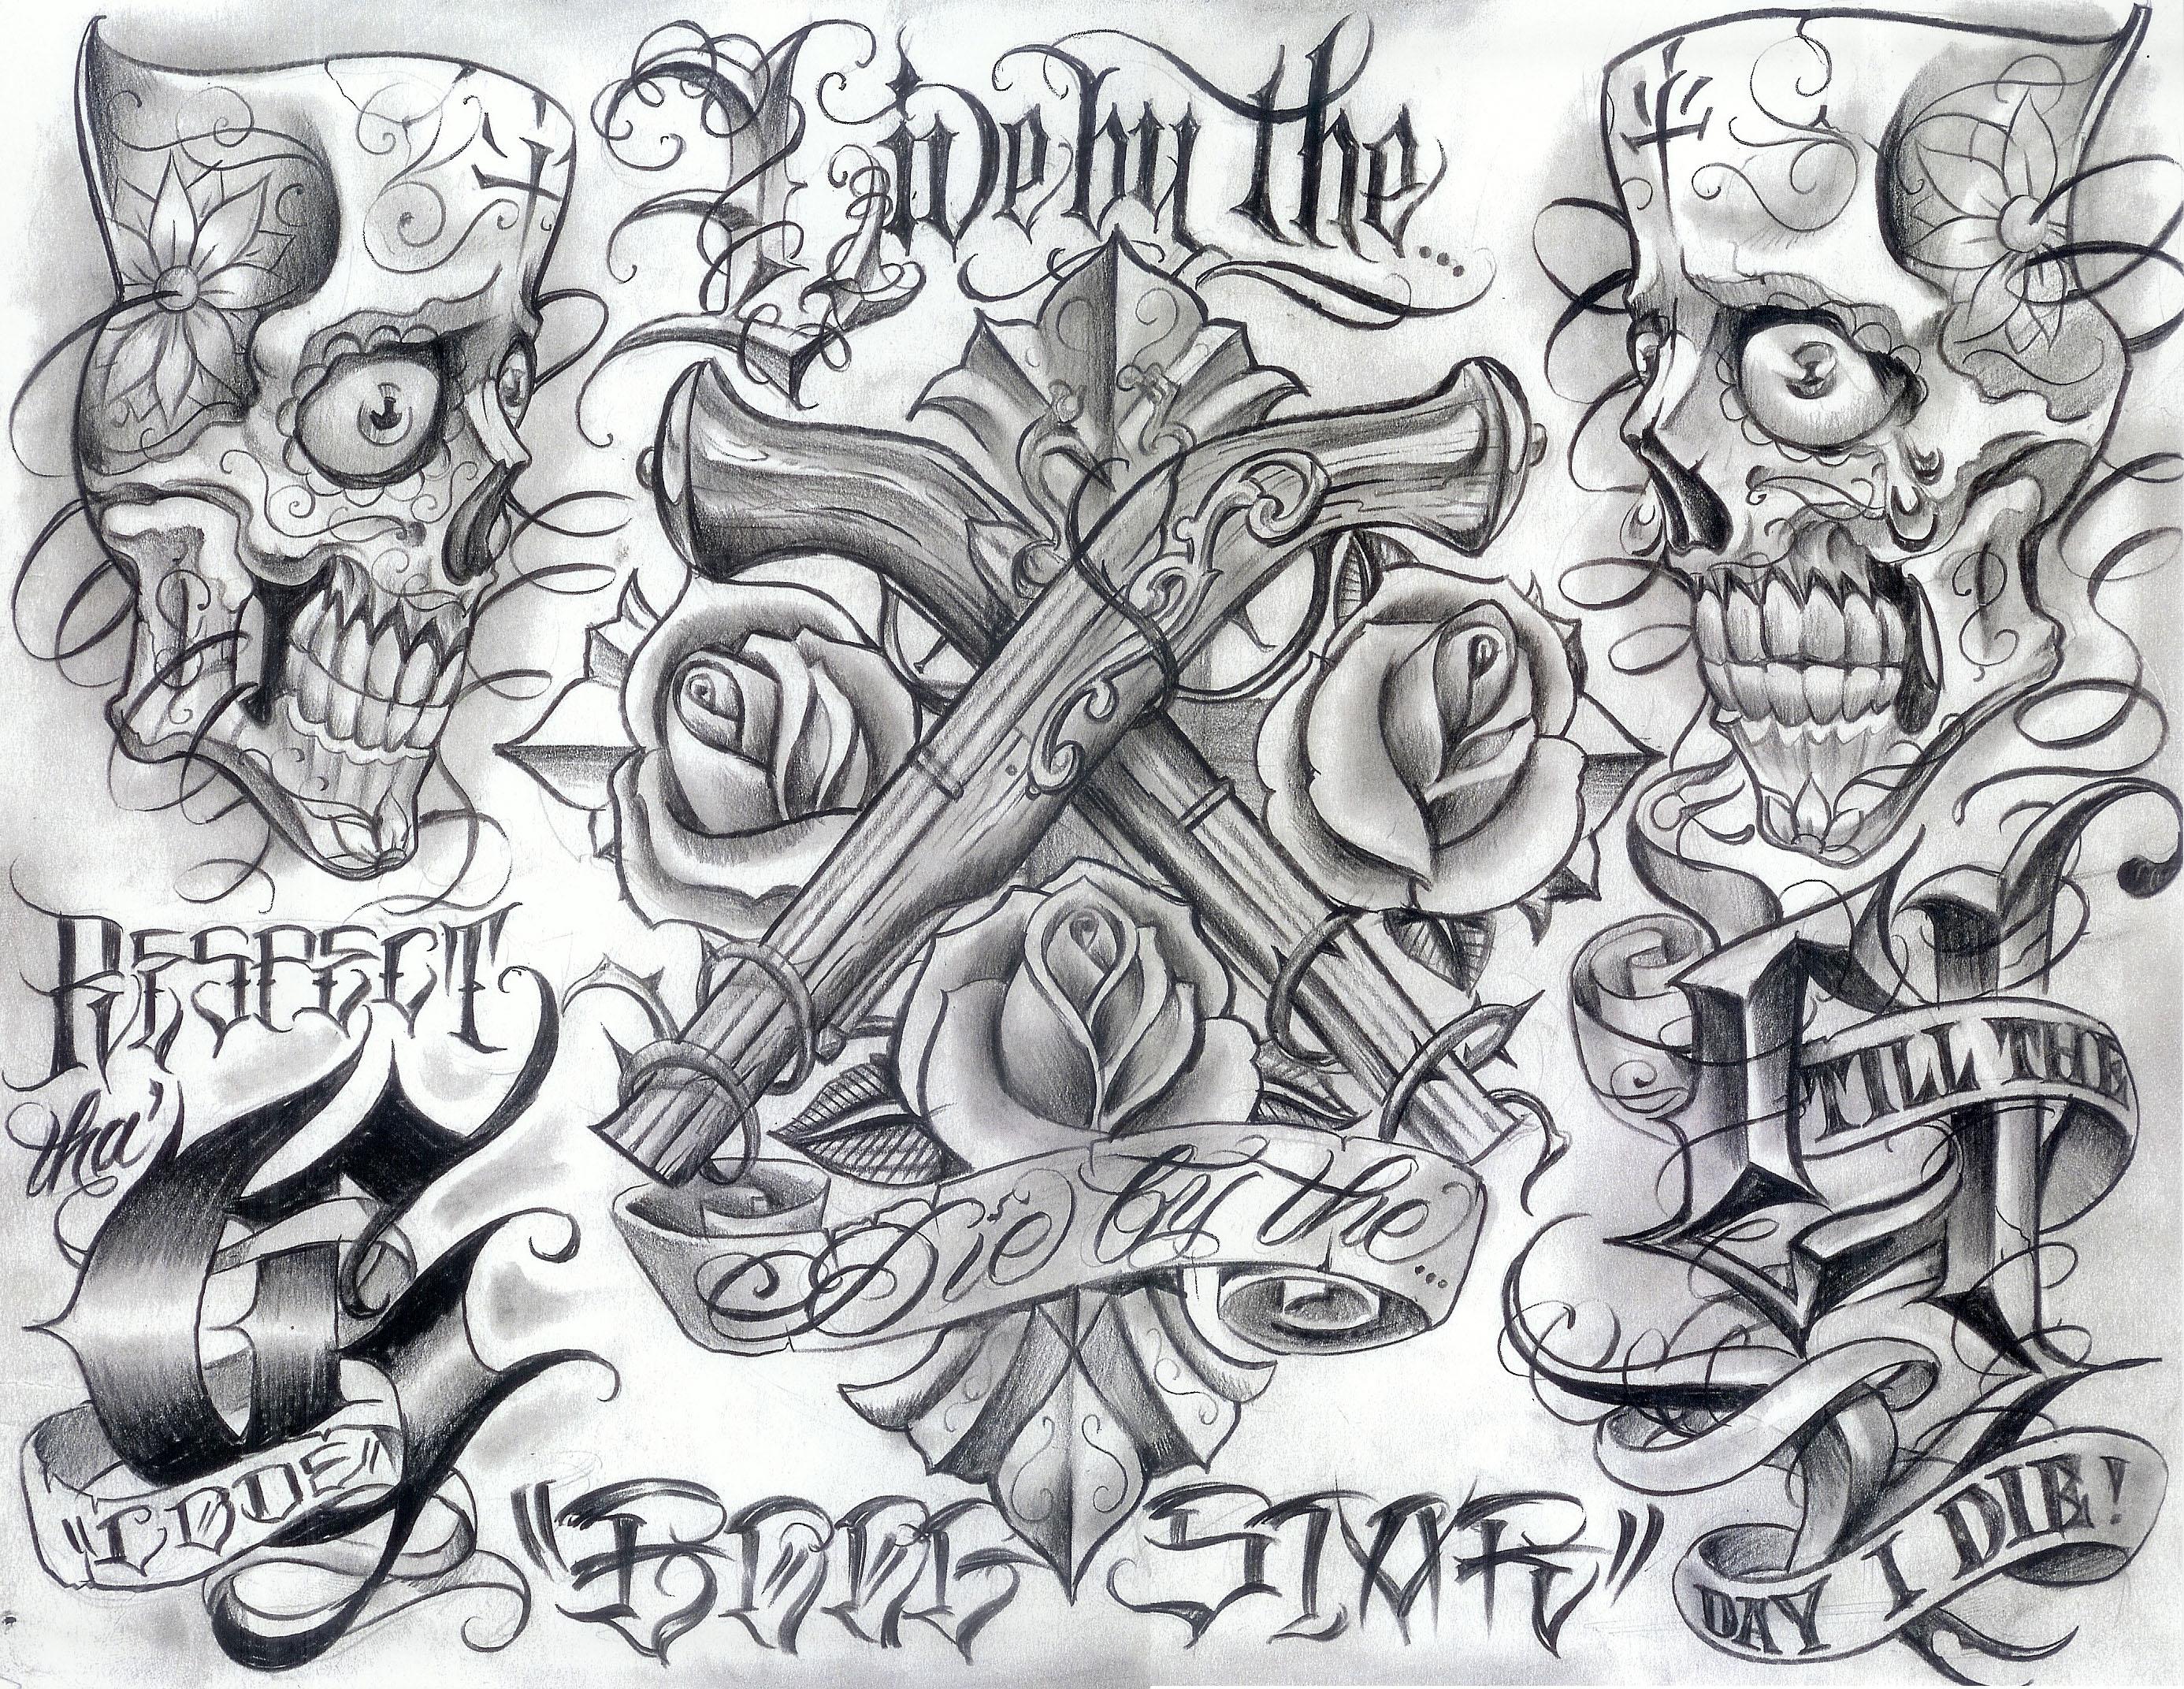 Pin Boog Flash Tattoo Drawings Pic 15 on Pinterest